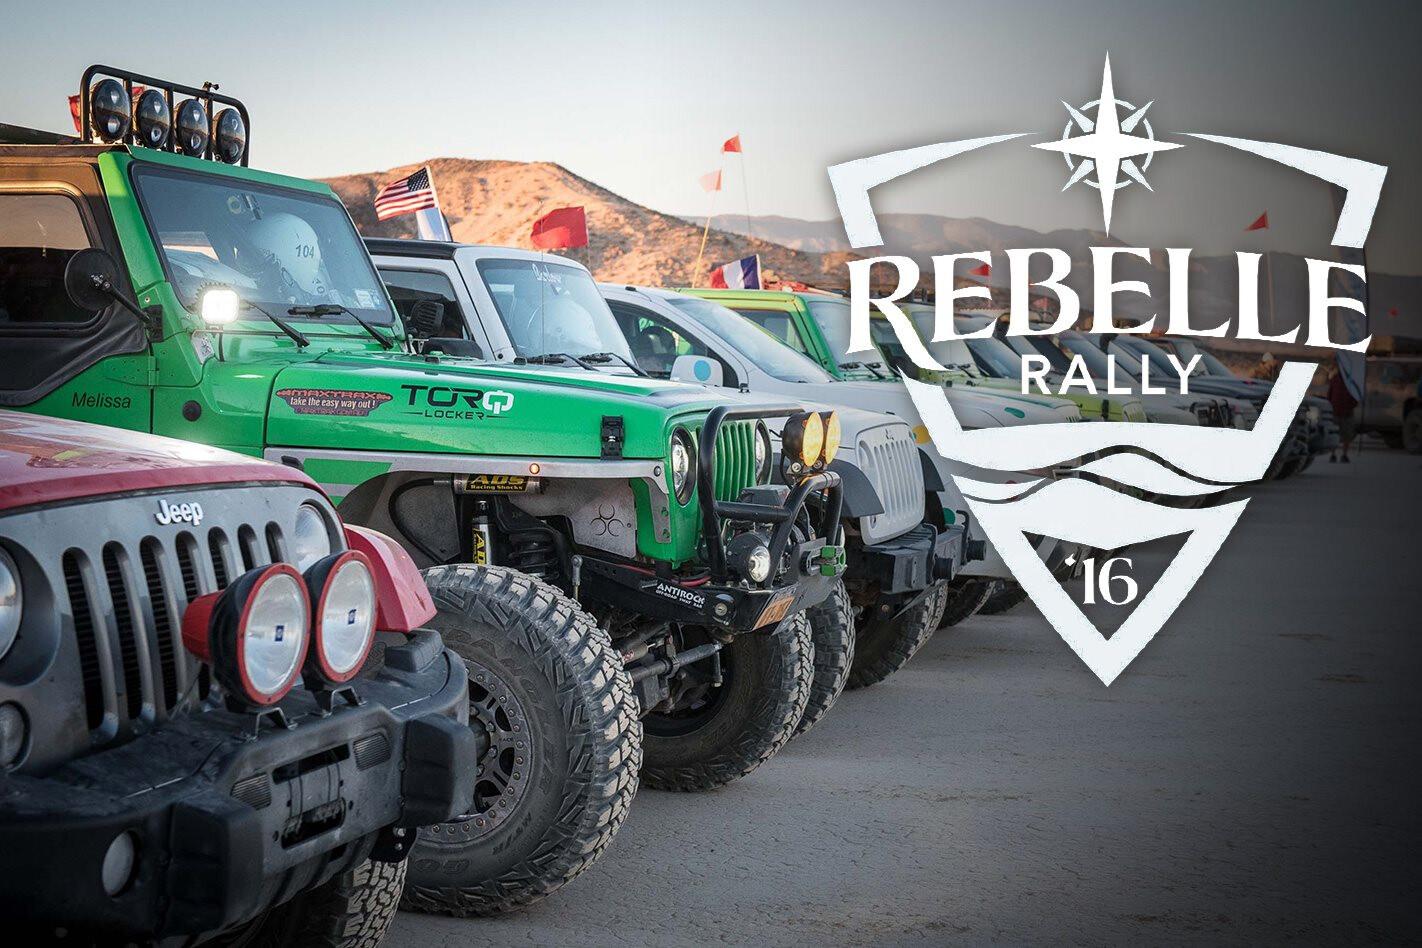 2016 Rebelle Rally